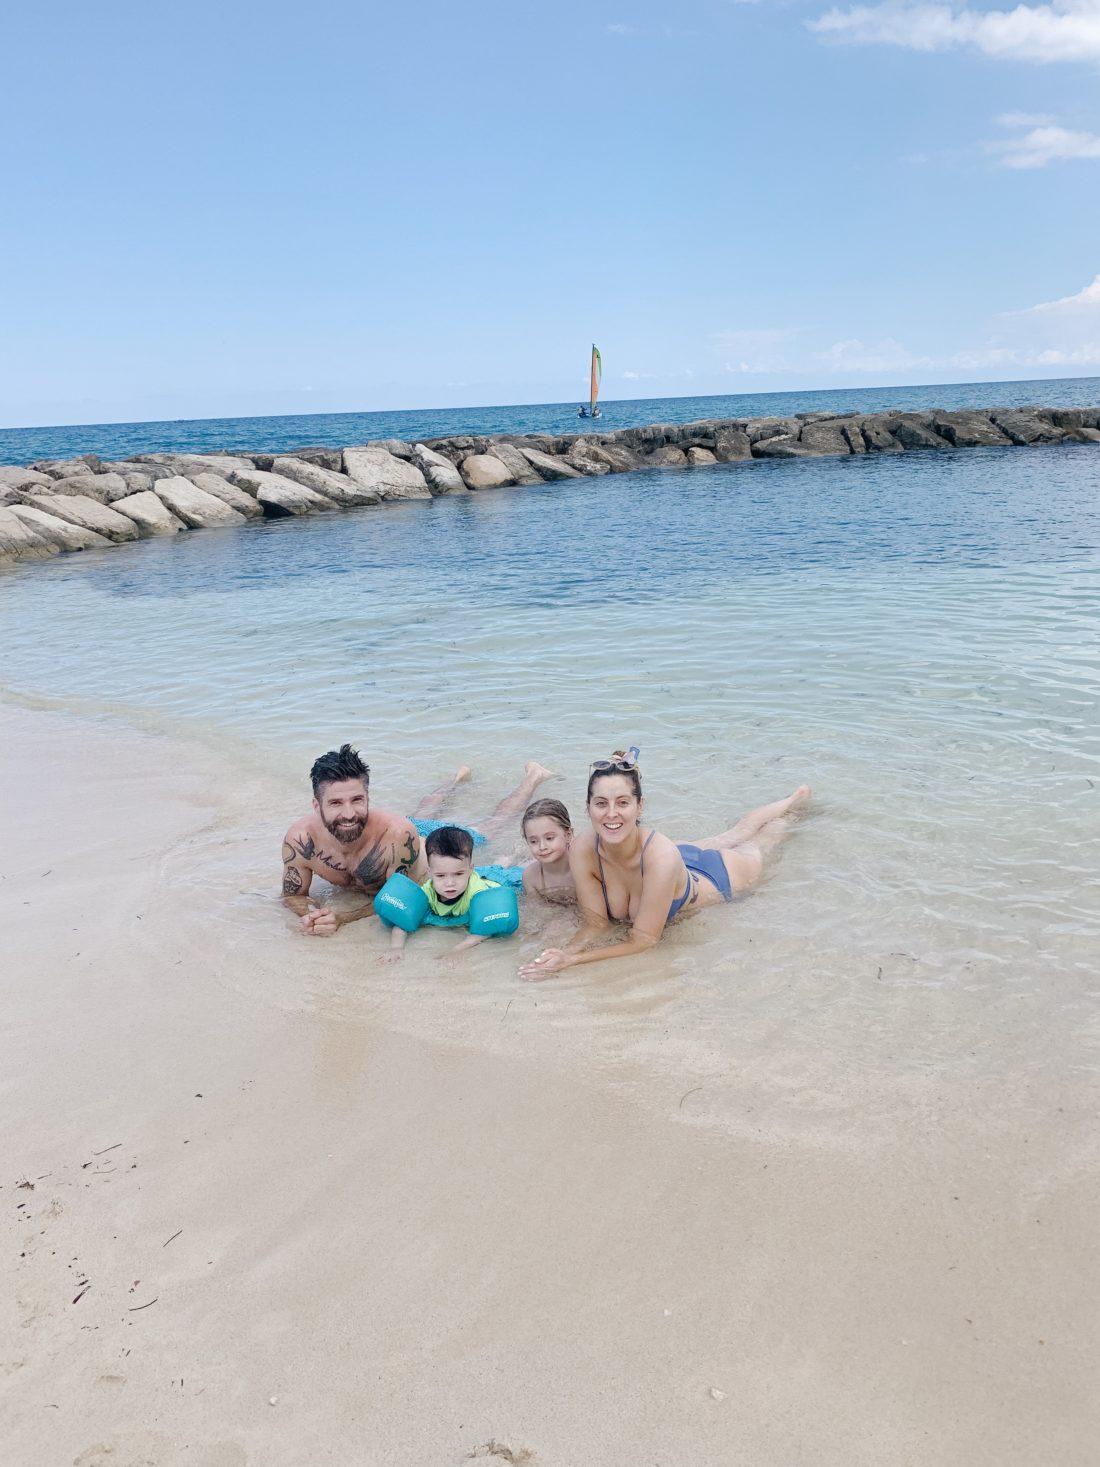 Eva Amurri Martino poses with her family on a trip to Jamaica